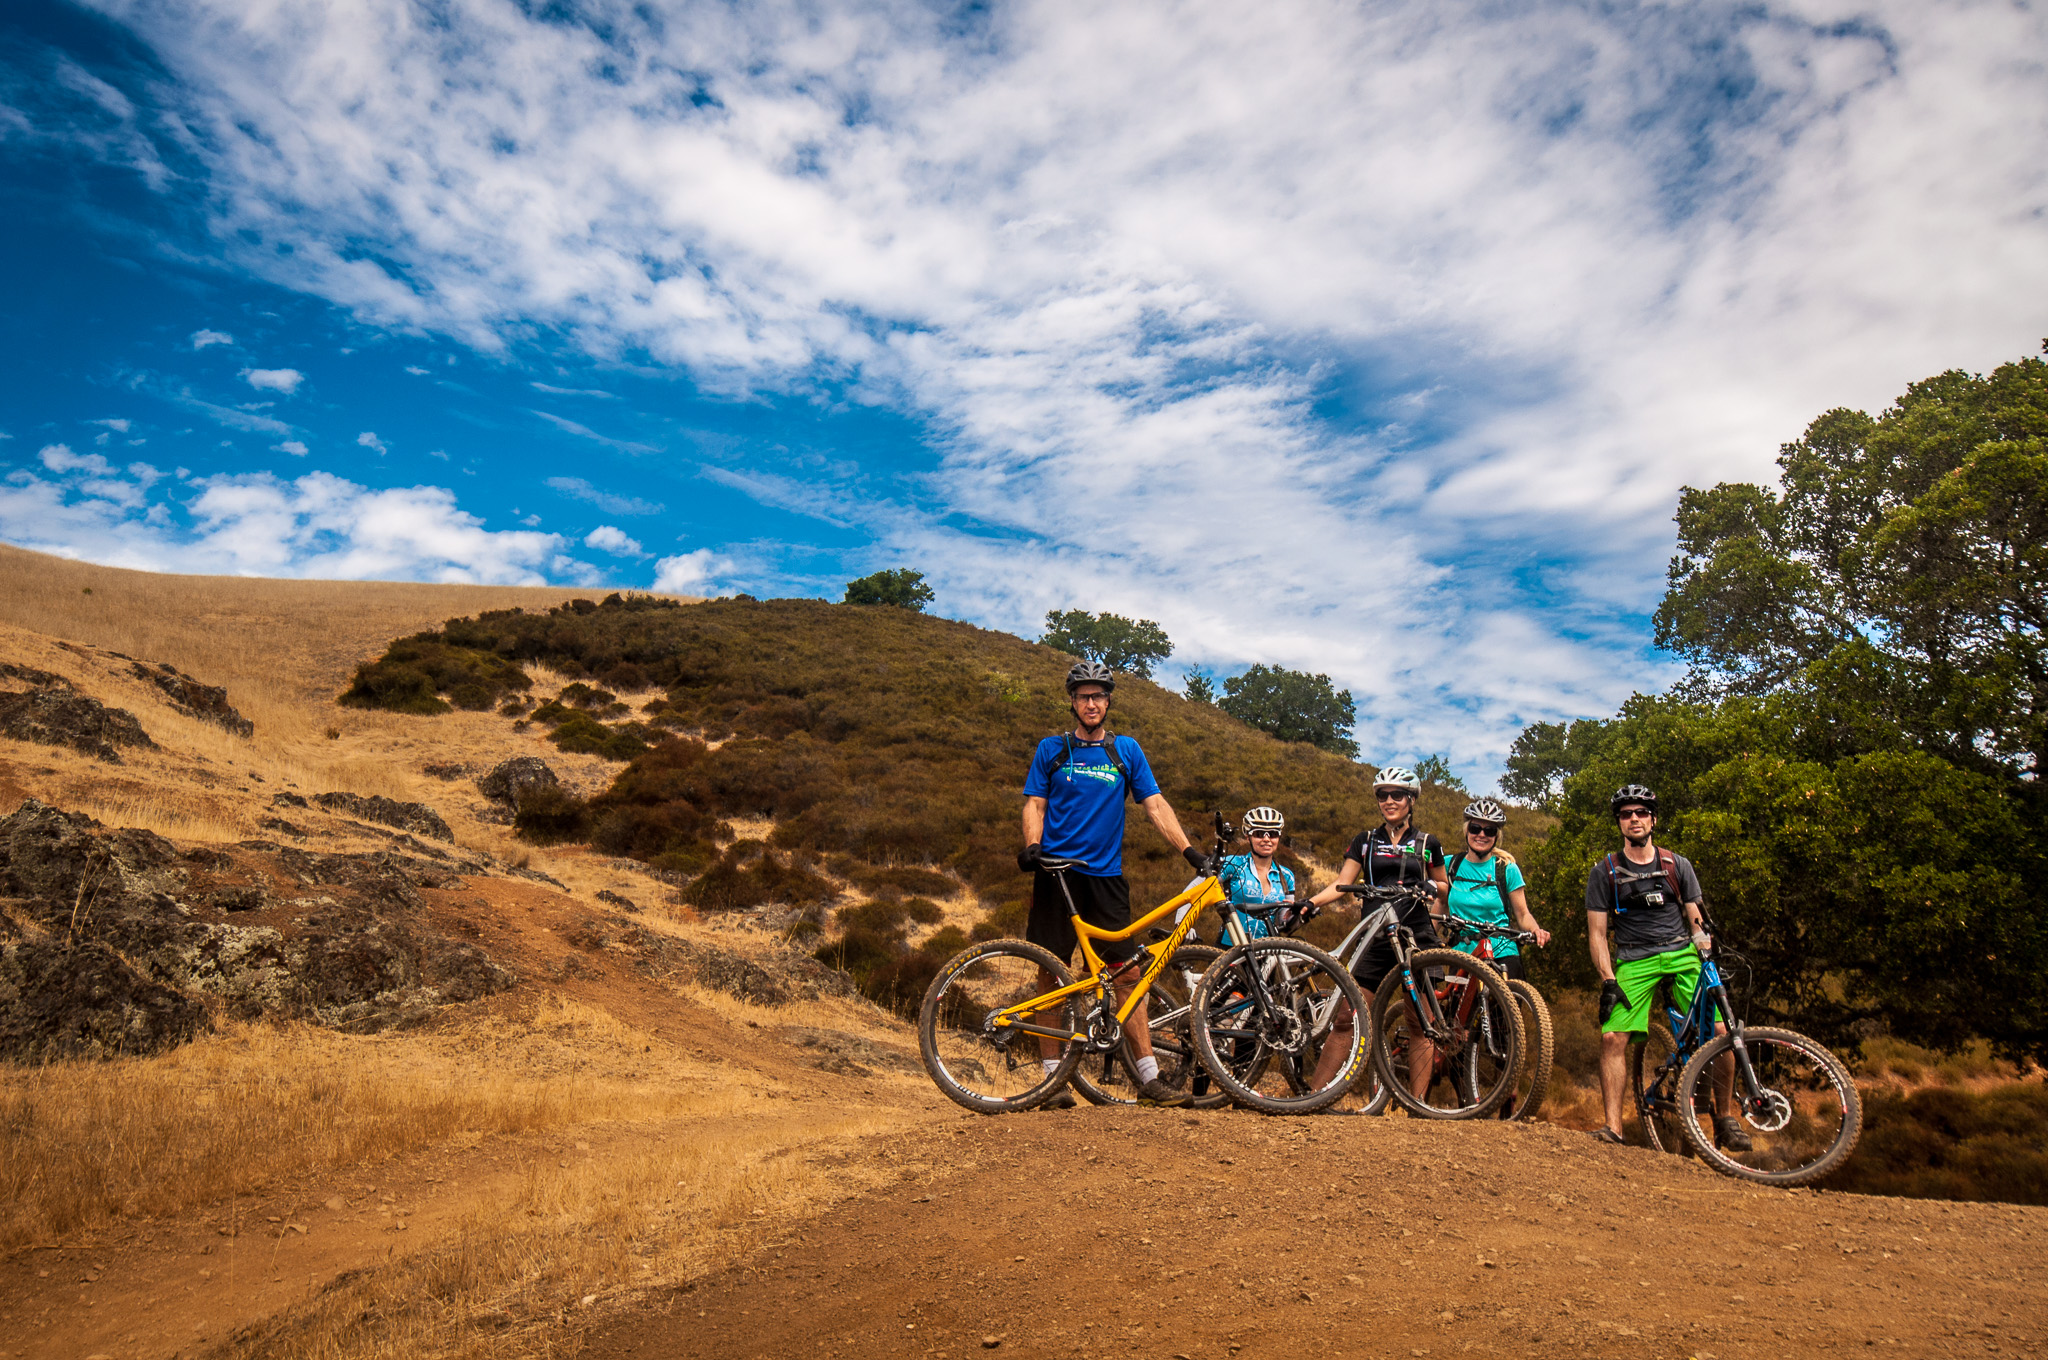 Hero Dirt Riders mountain biking at Tamarancho in Marin County